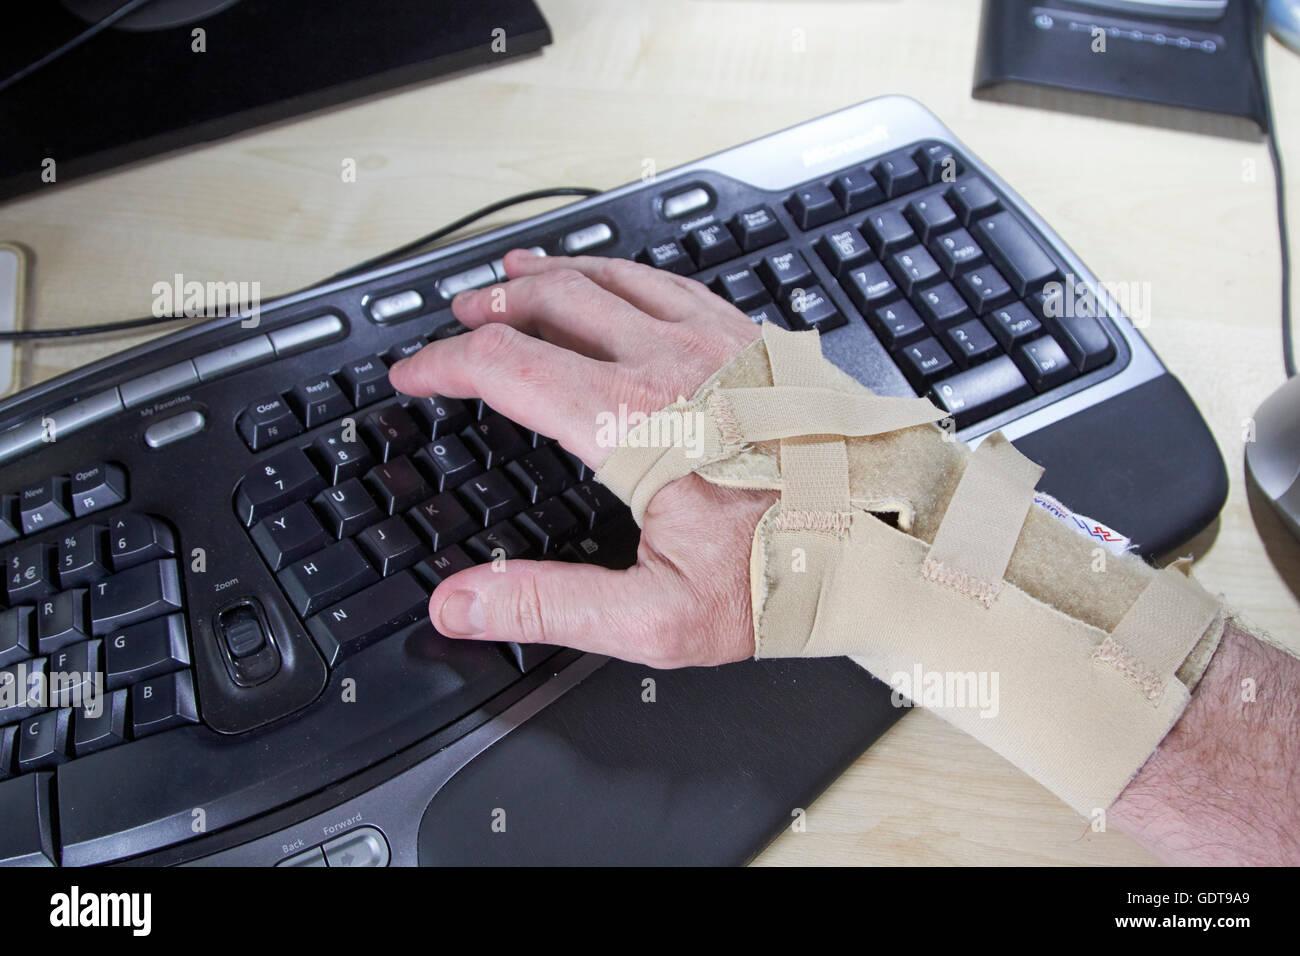 man wearing wrist split due to carpal tunnel syndrome using an ergonomic keyboard - Stock Image